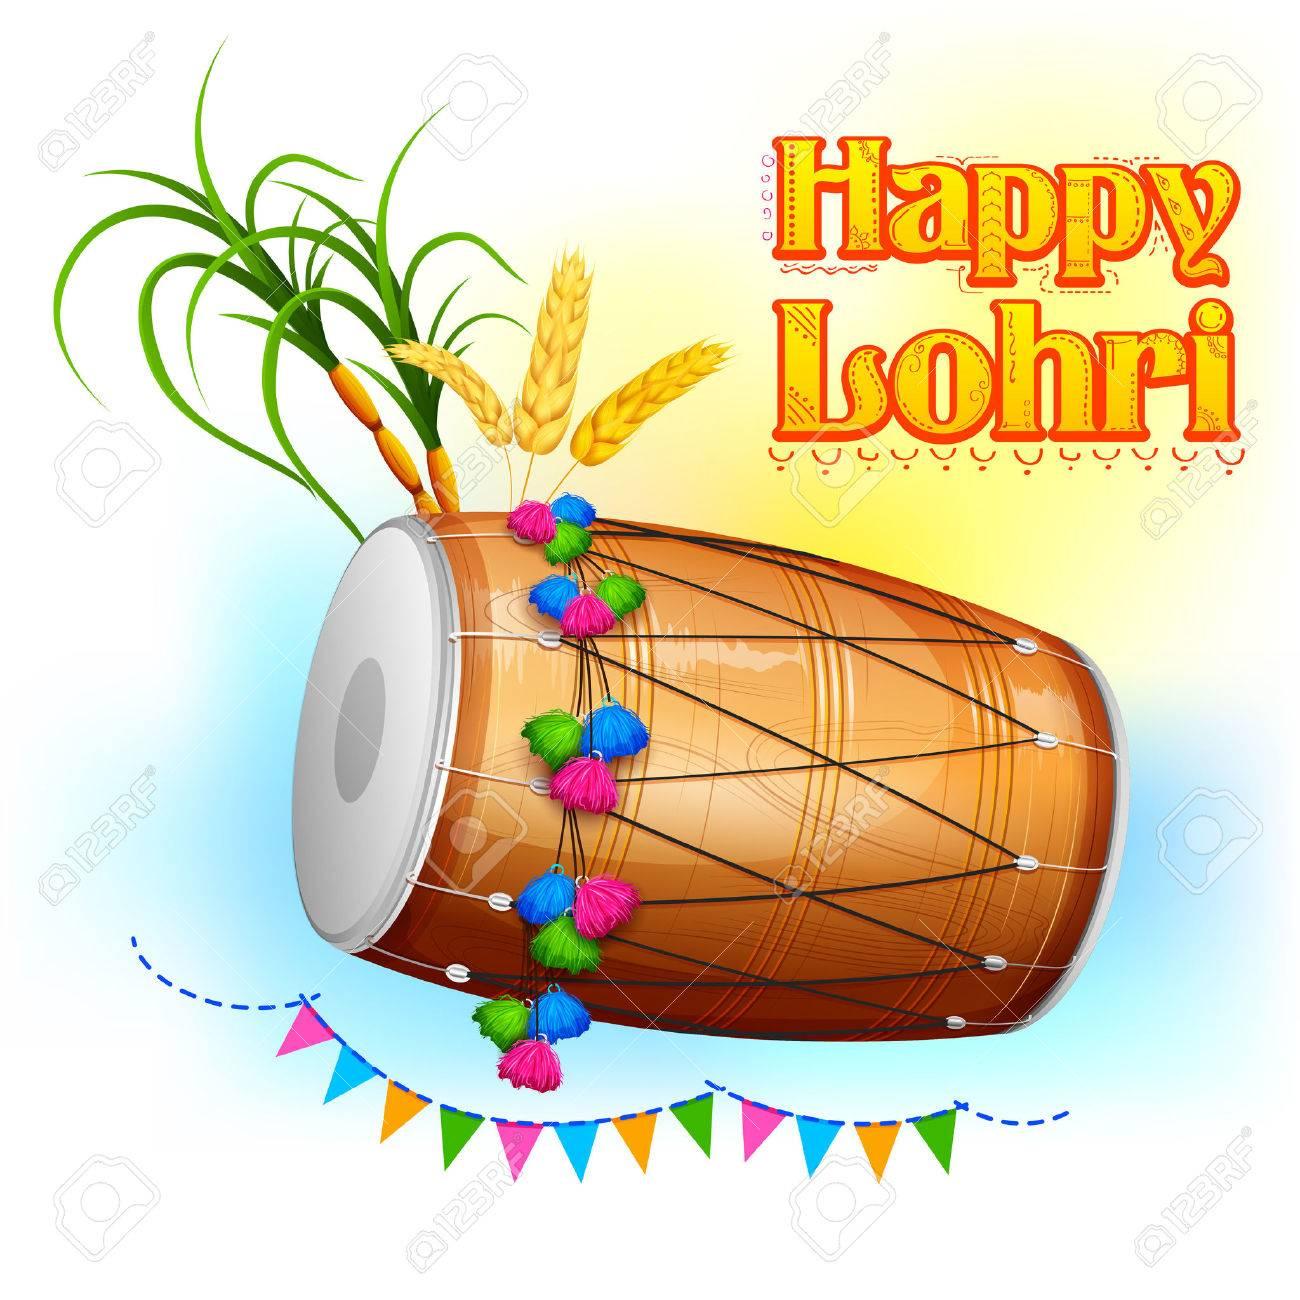 illustration of Happy Lohri background for Punjabi festival - 50223527